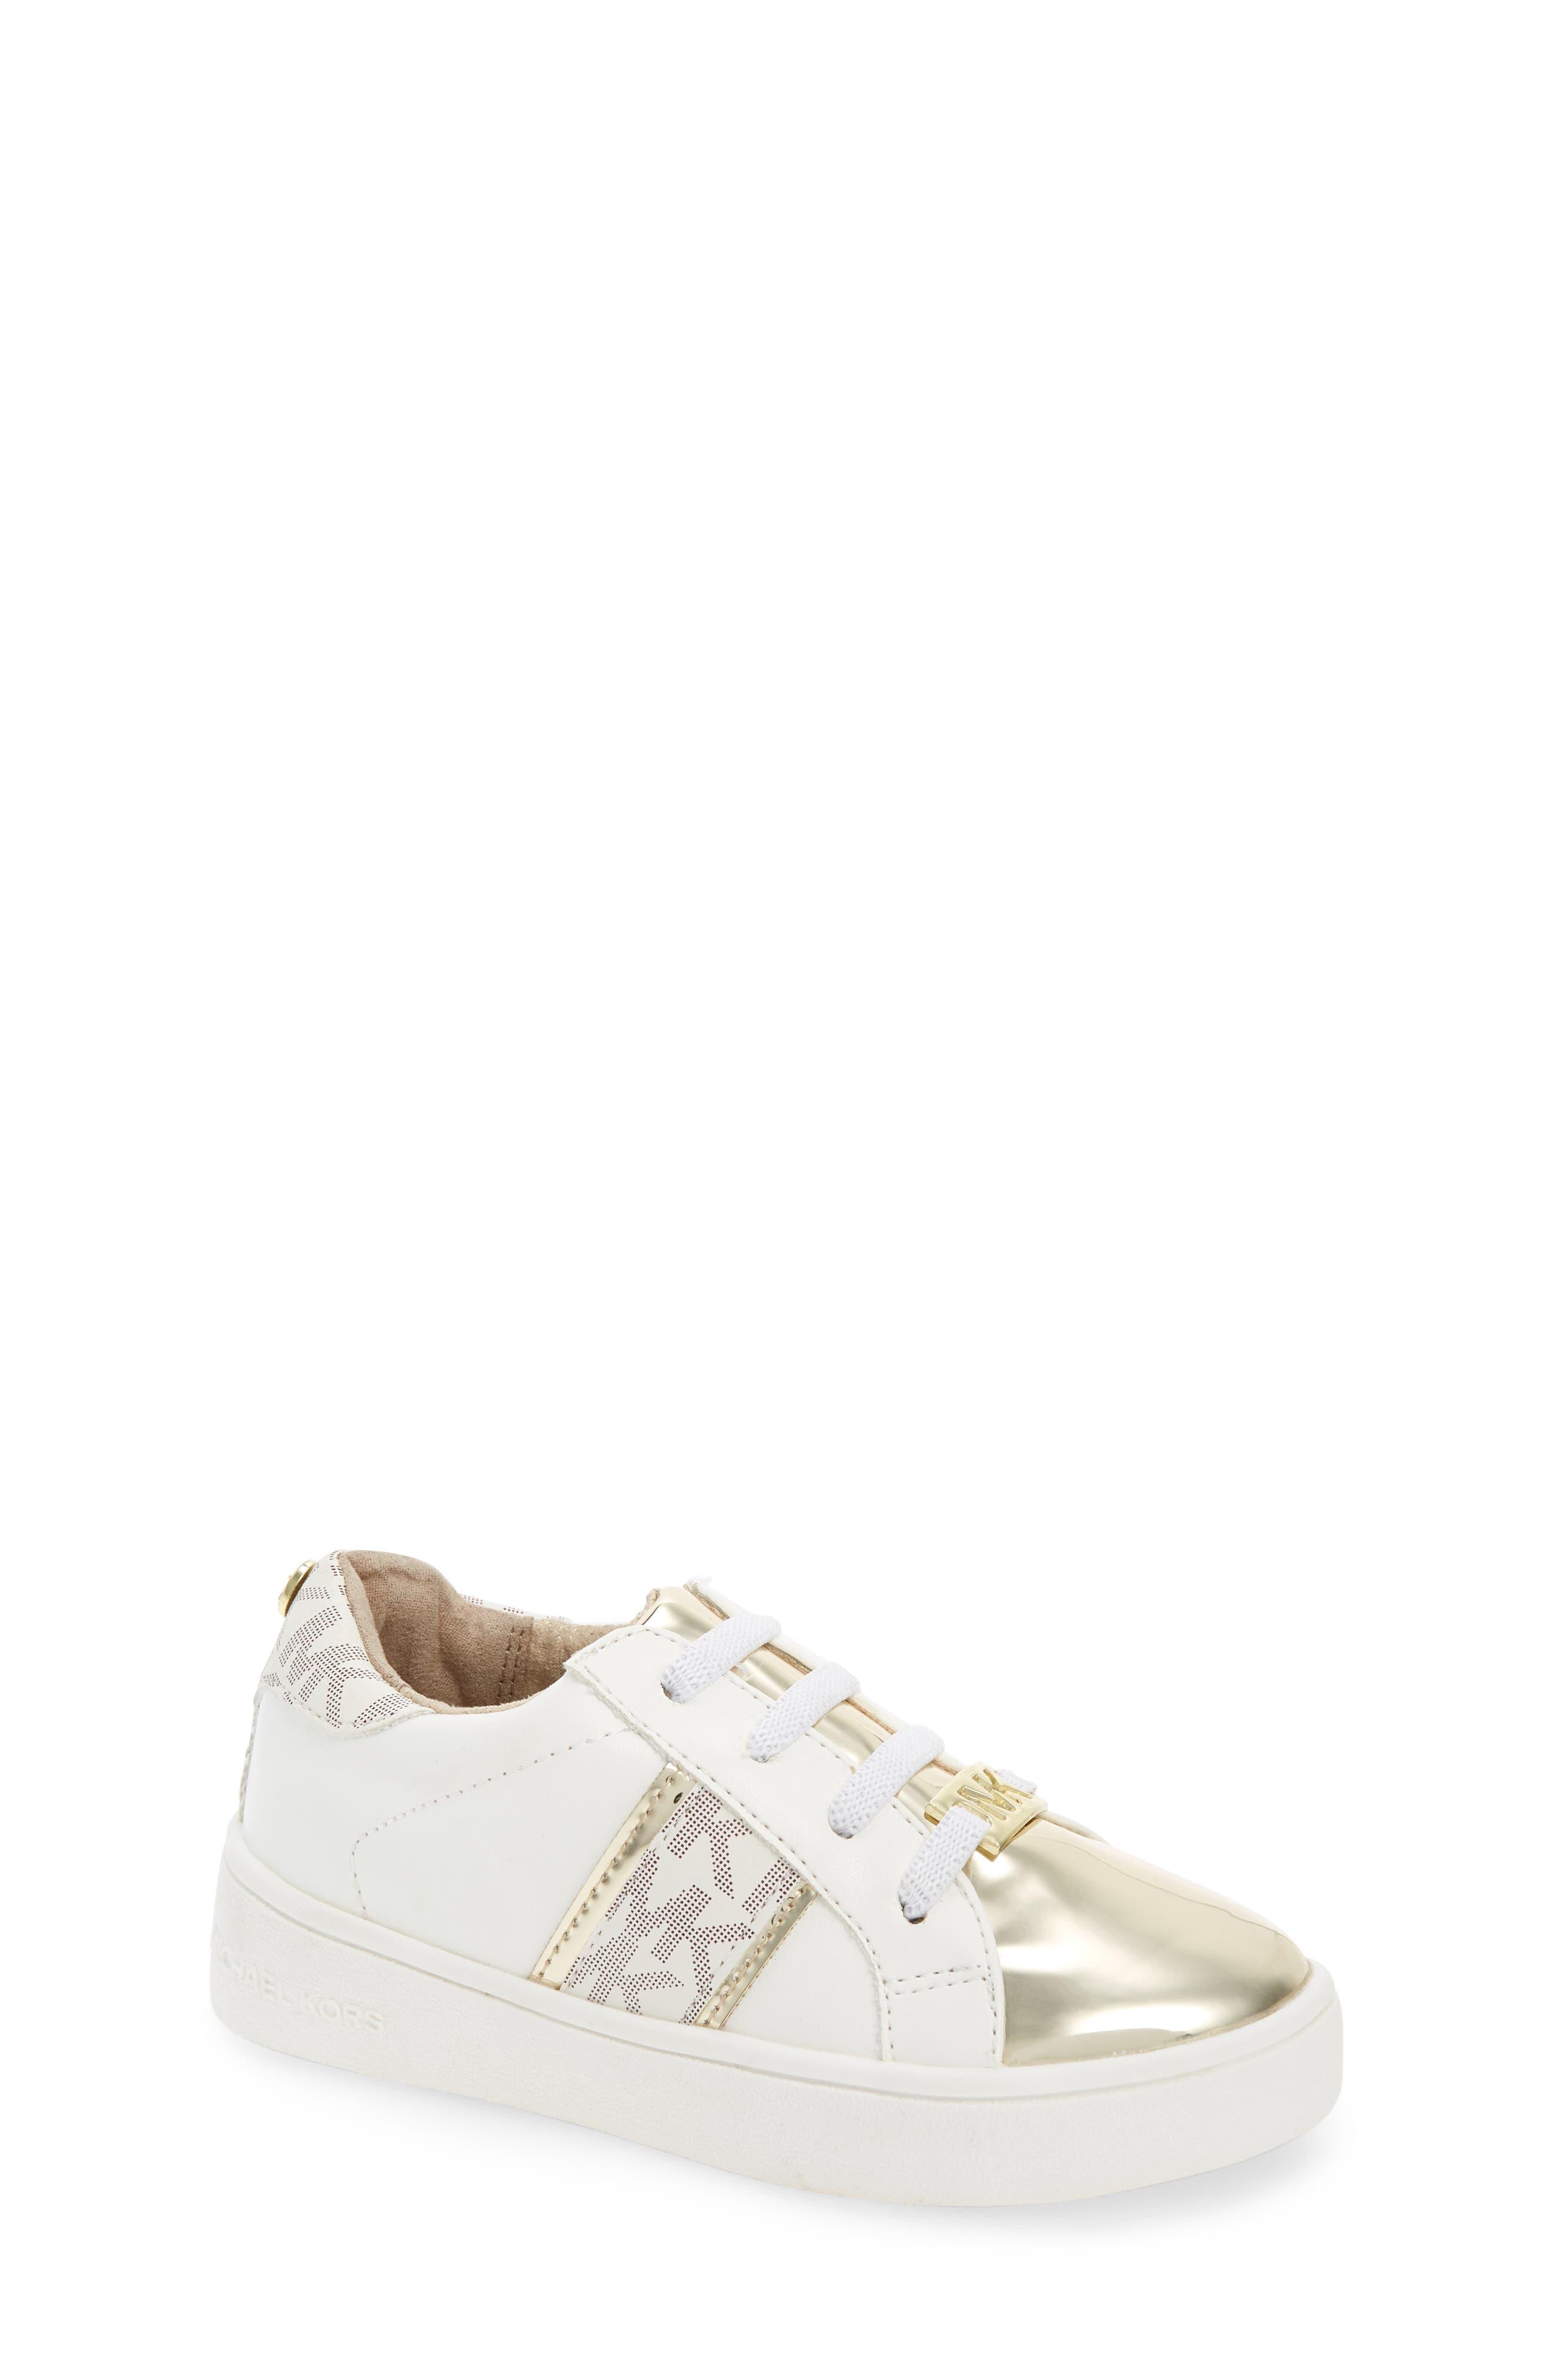 MICHAEL MICHAEL KORS,                             Ivy Frankie Metallic Logo Sneaker,                             Main thumbnail 1, color,                             100